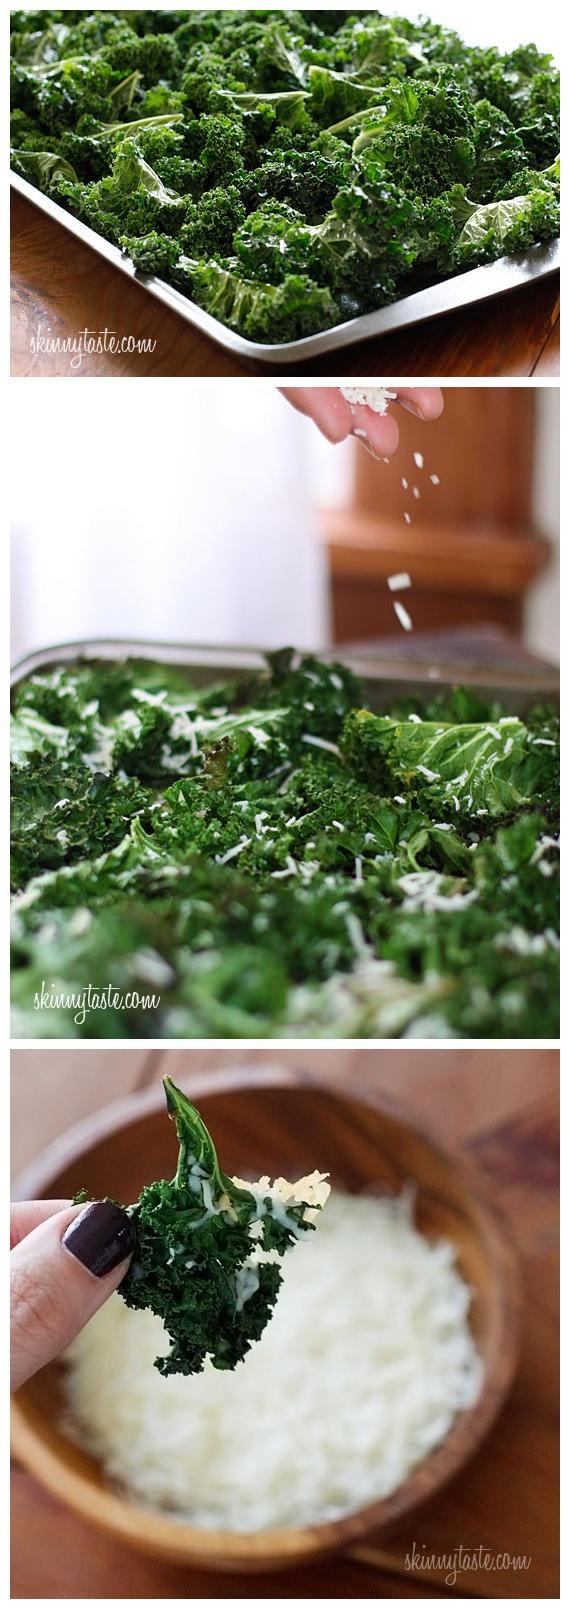 Baked Parmesan Kale Chips | healthy stuff | Pinterest